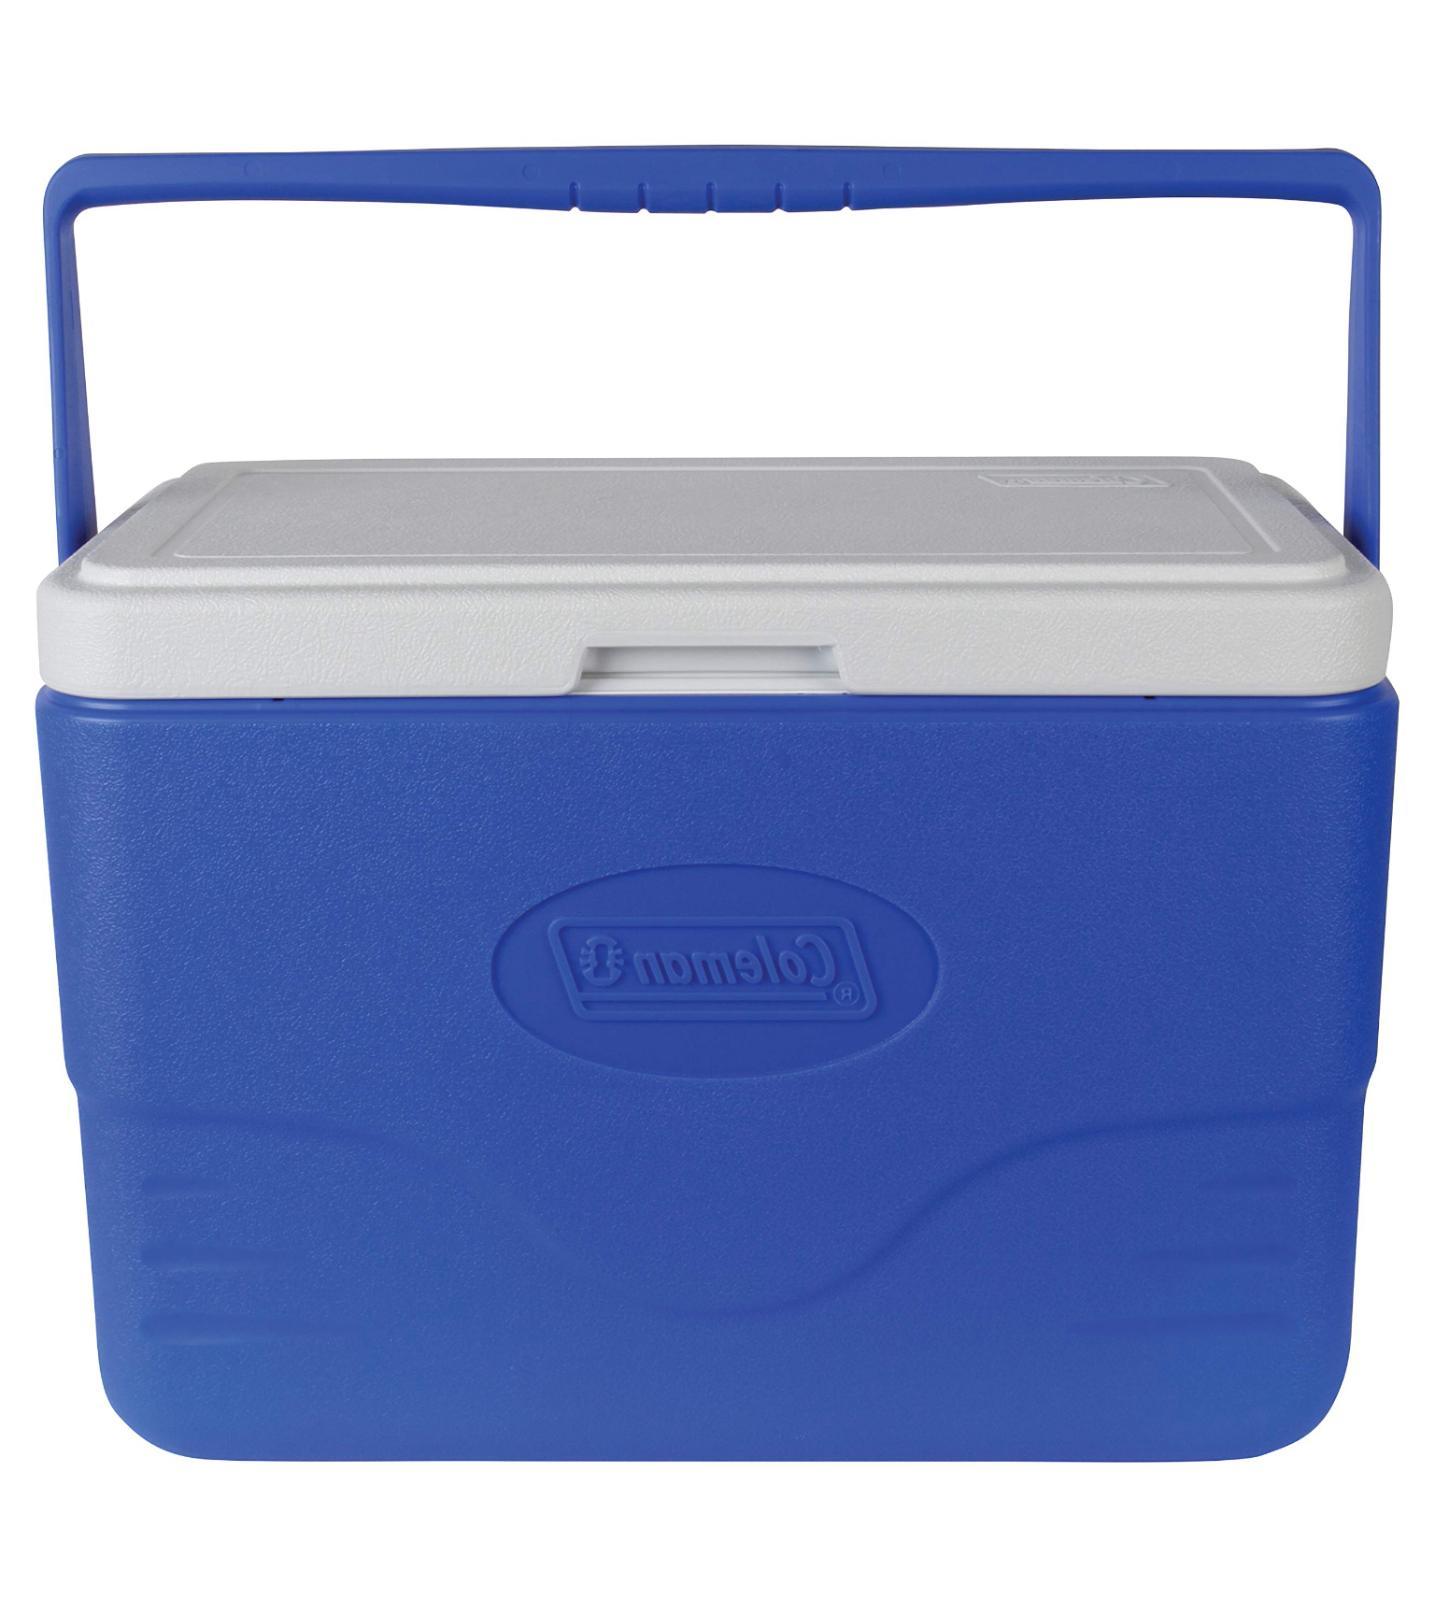 summer item 28 quart cooler with bail